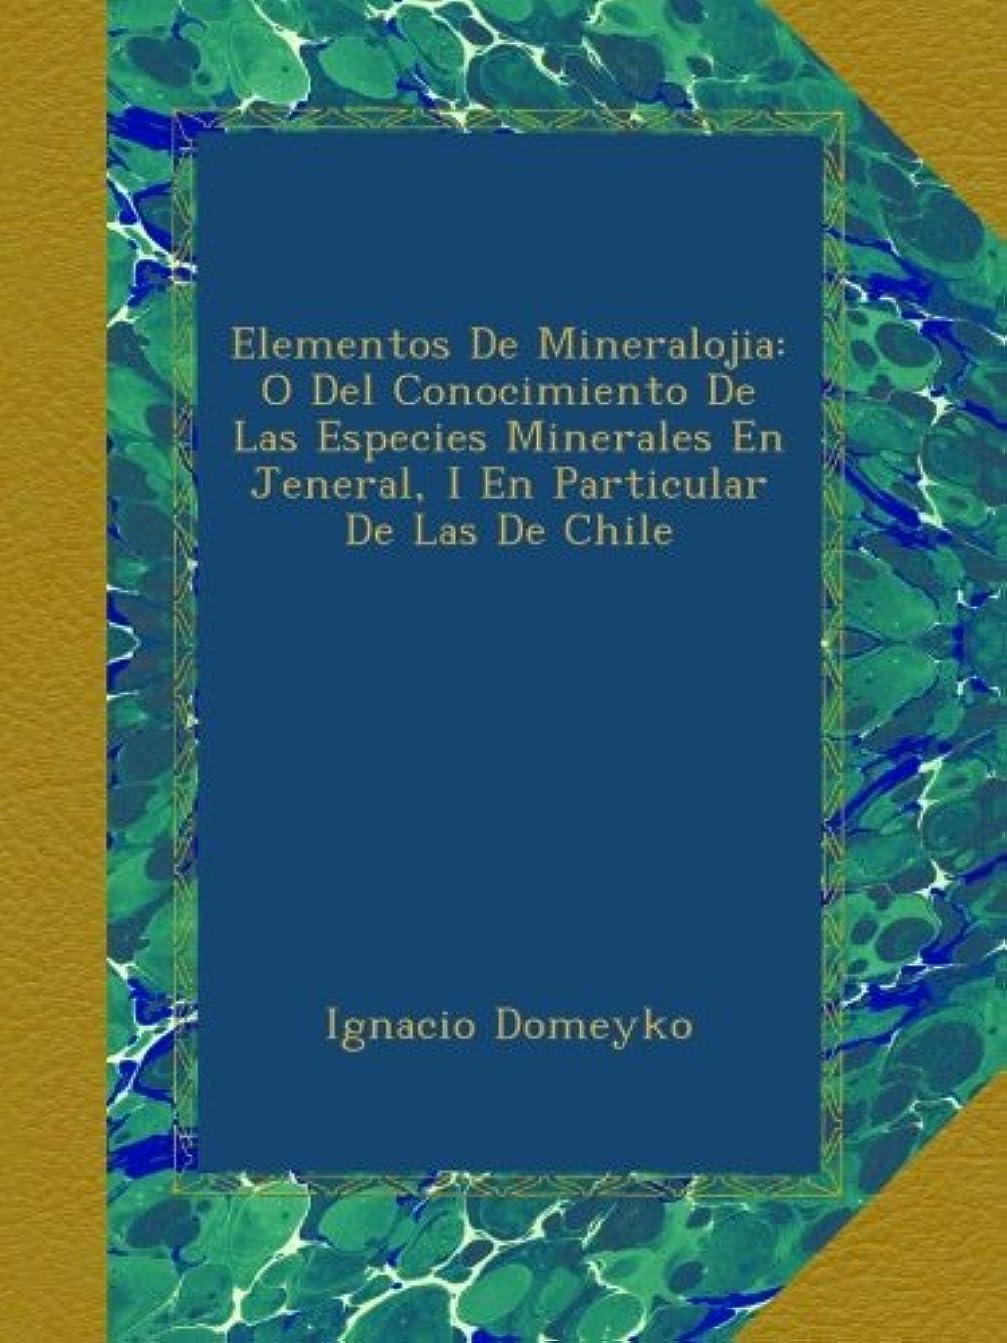 スポンサーねじれヶ月目Elementos De Mineralojia: O Del Conocimiento De Las Especies Minerales En Jeneral, I En Particular De Las De Chile